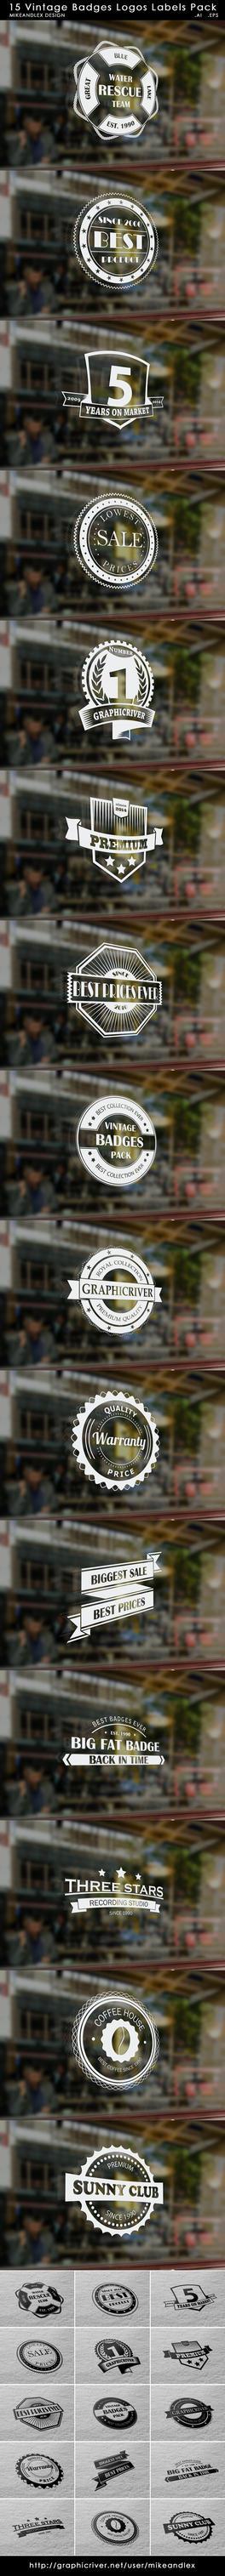 15-vintage-badges-logos-labels-pack by mikeandlex